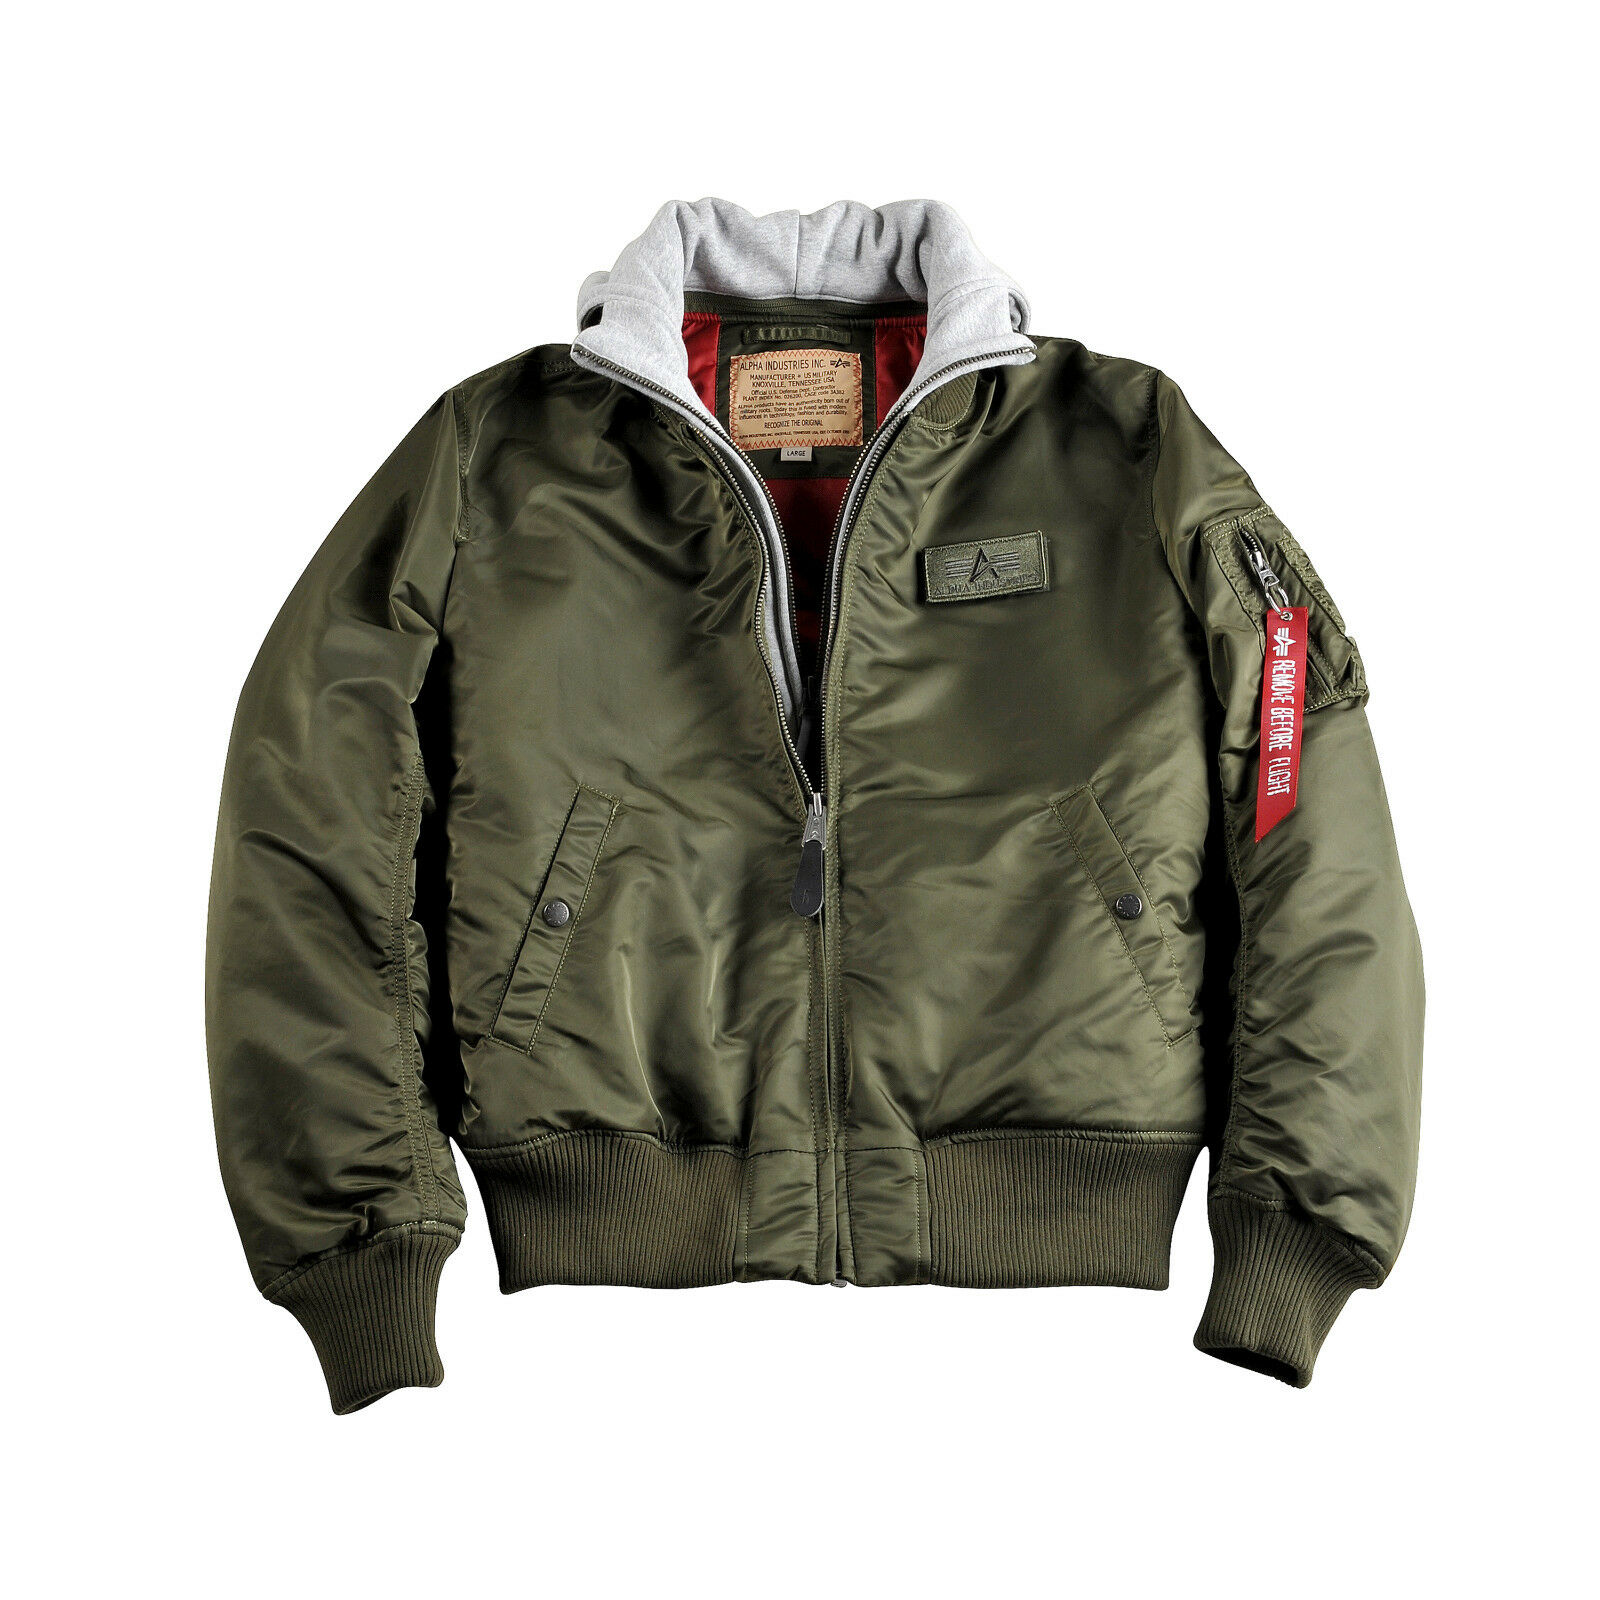 Details about Alpha Industries ma 1 D Tec Jacket Flight Jacket Bomber Jacket Jacket Men's Hood show original title